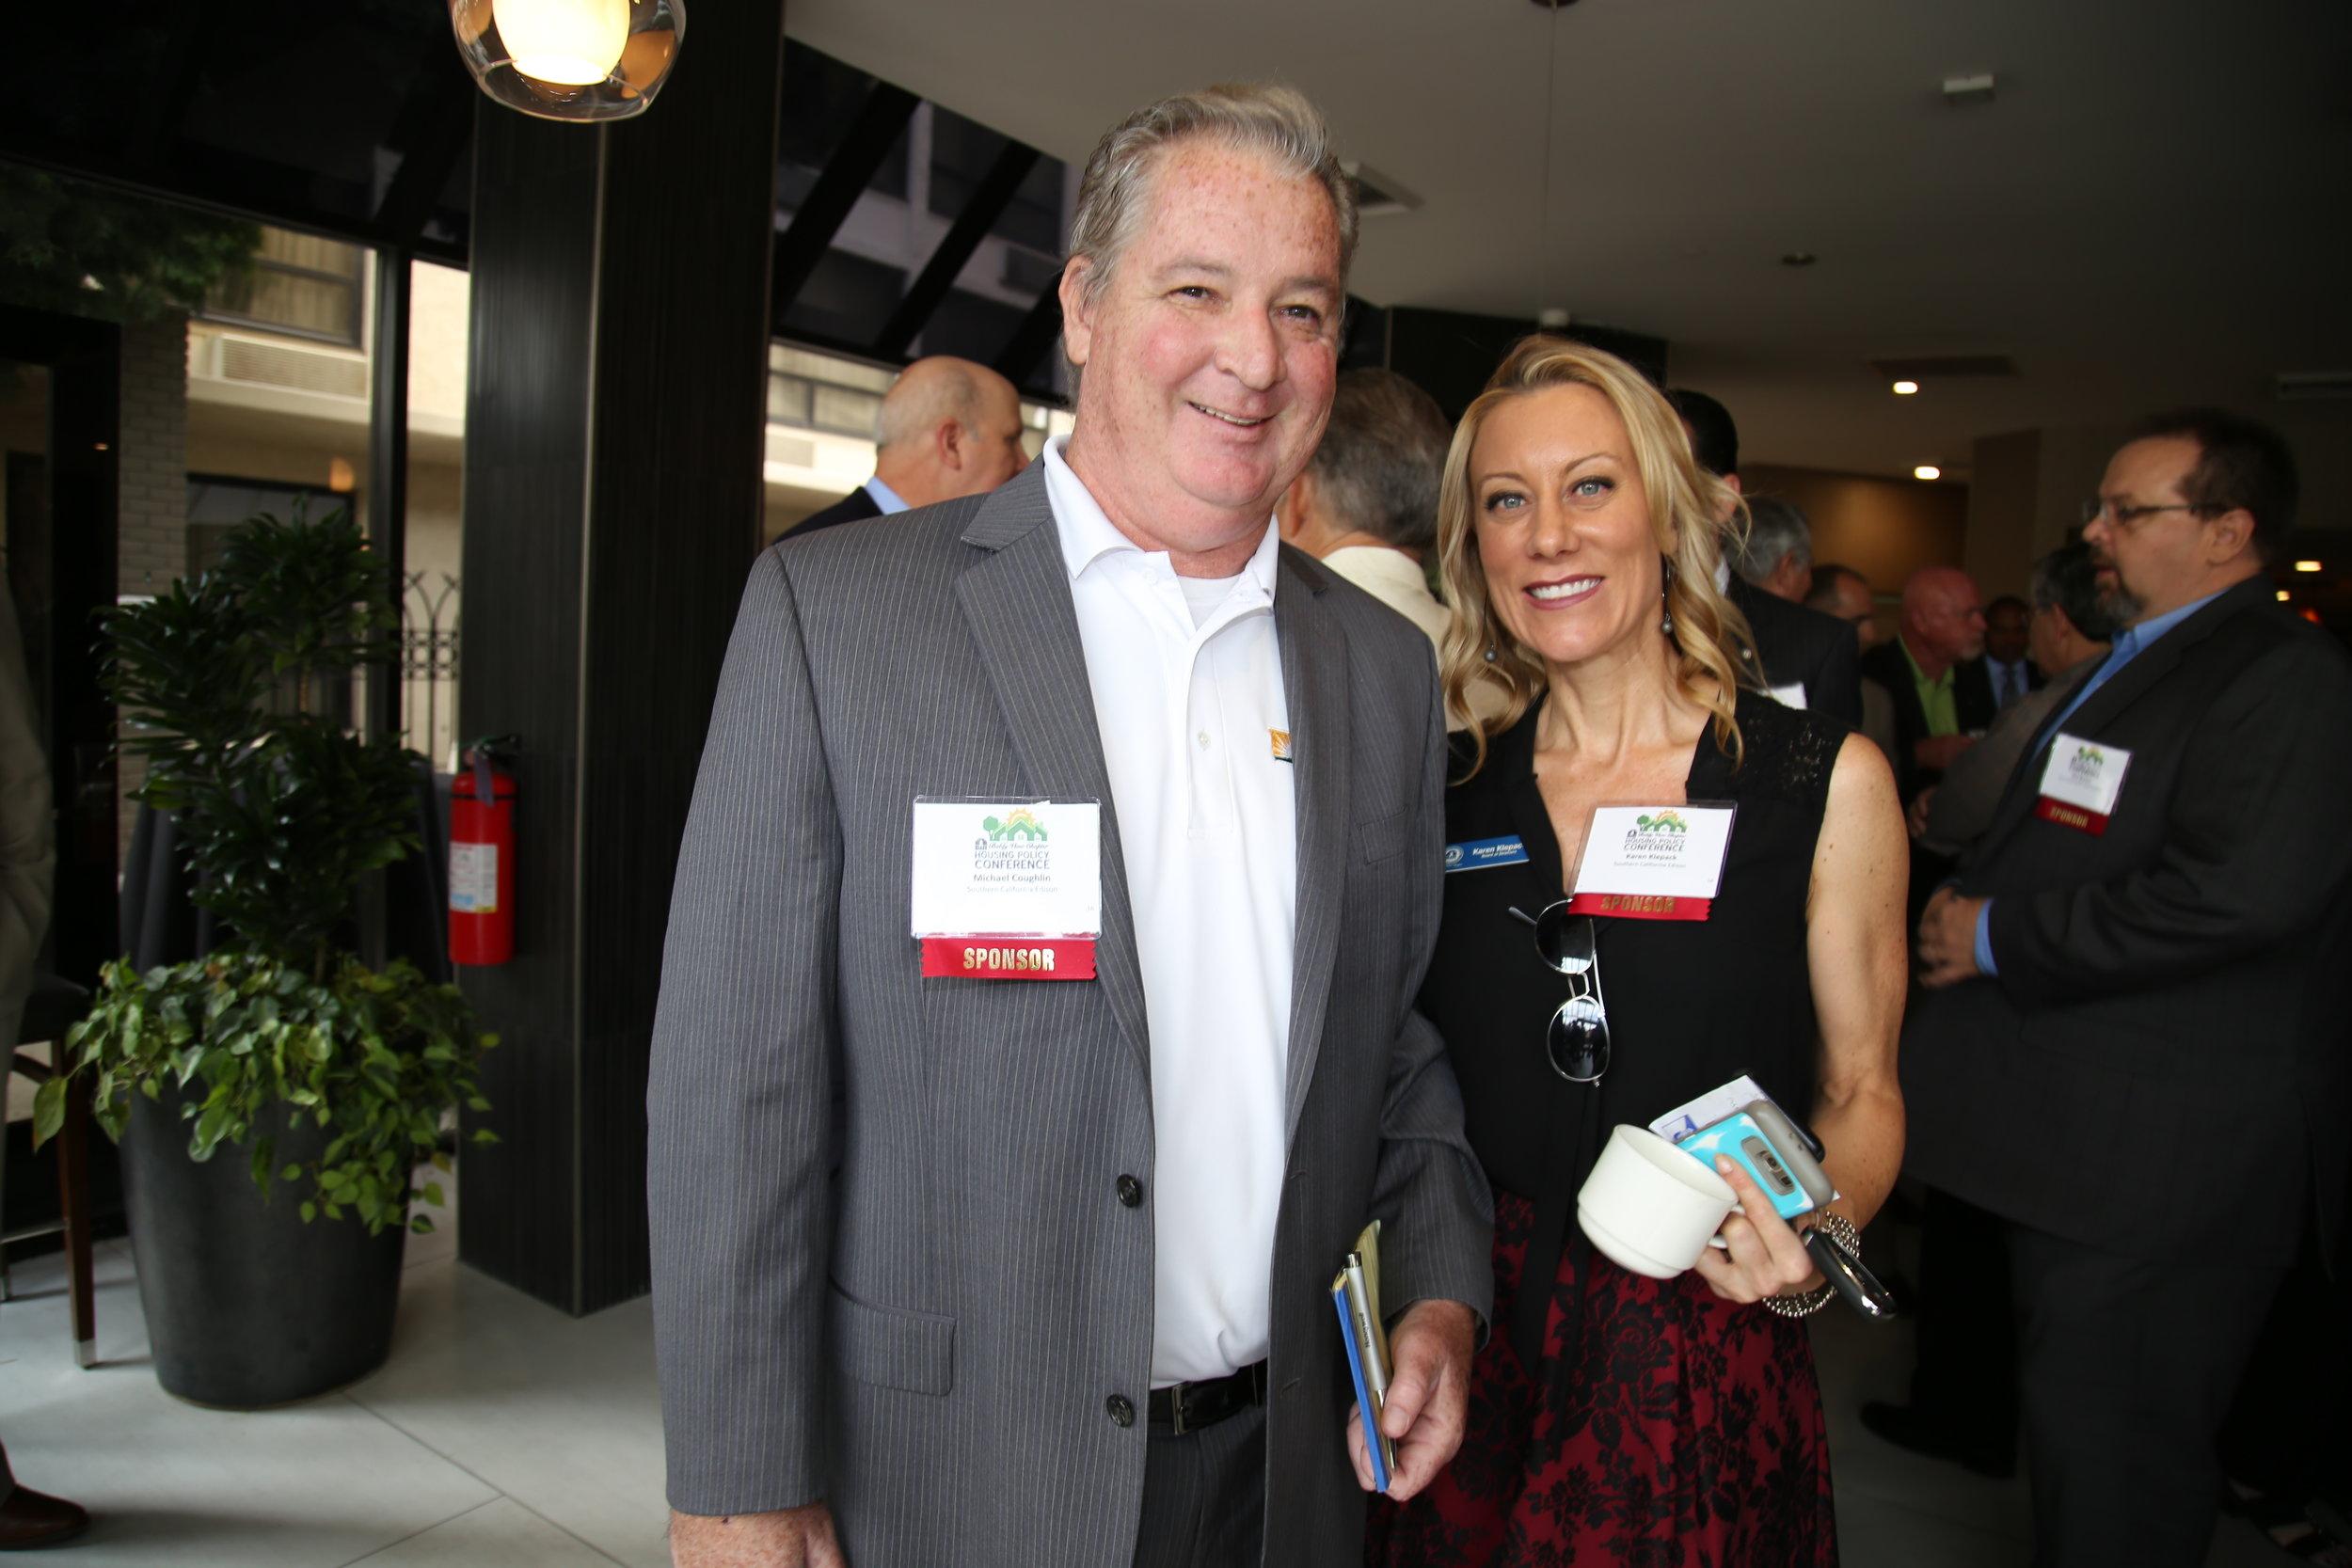 BIABV Board of Directors member Karen Klepack and colleague represent Southern California Edison at our VIP Reception